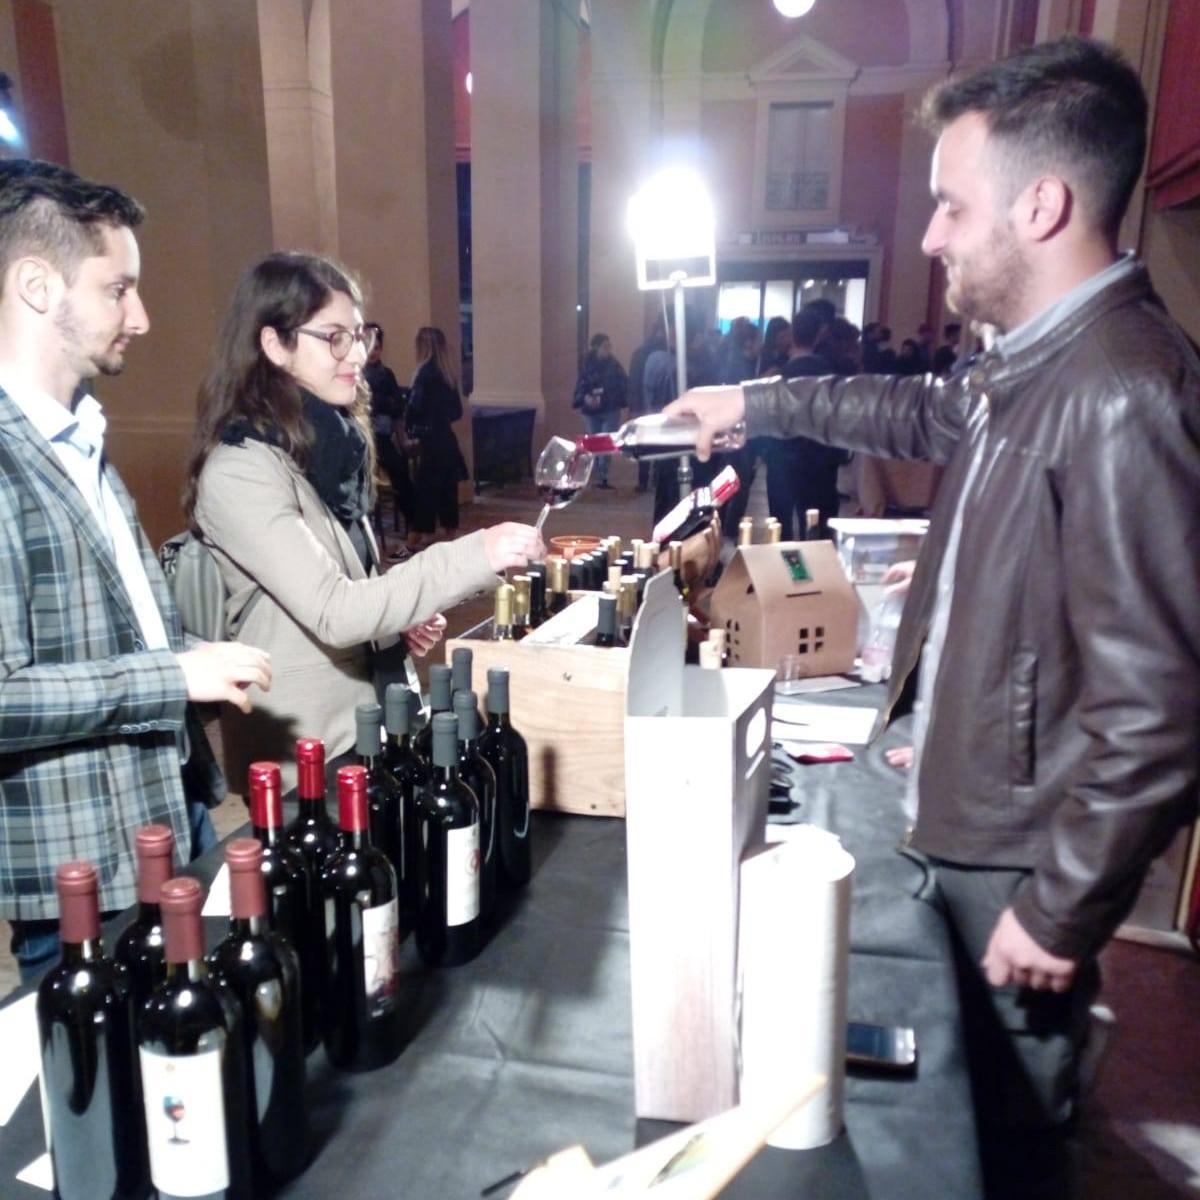 degustazione vini zinzani faenza